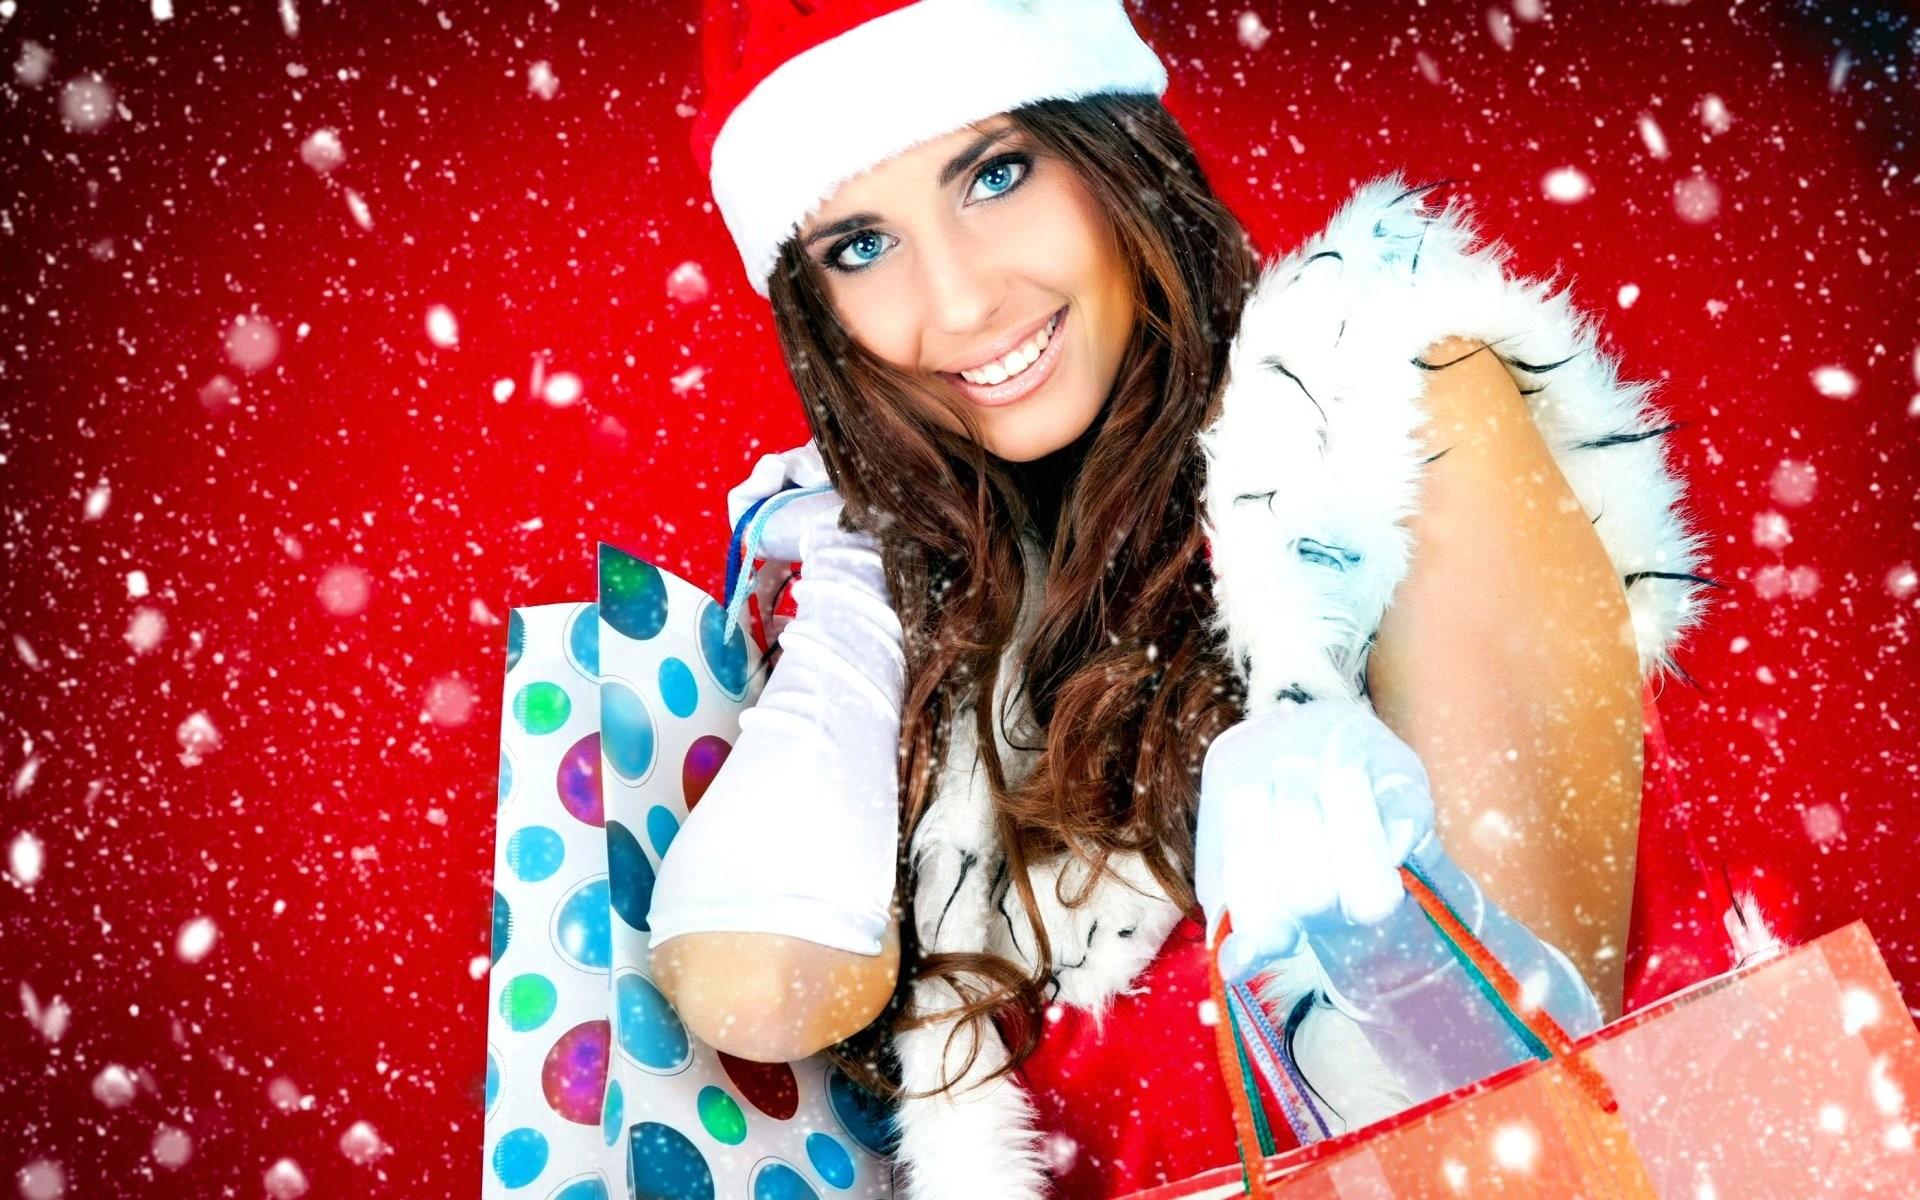 Z Wallpaper Christmas Beautiful Girl Santa Claus